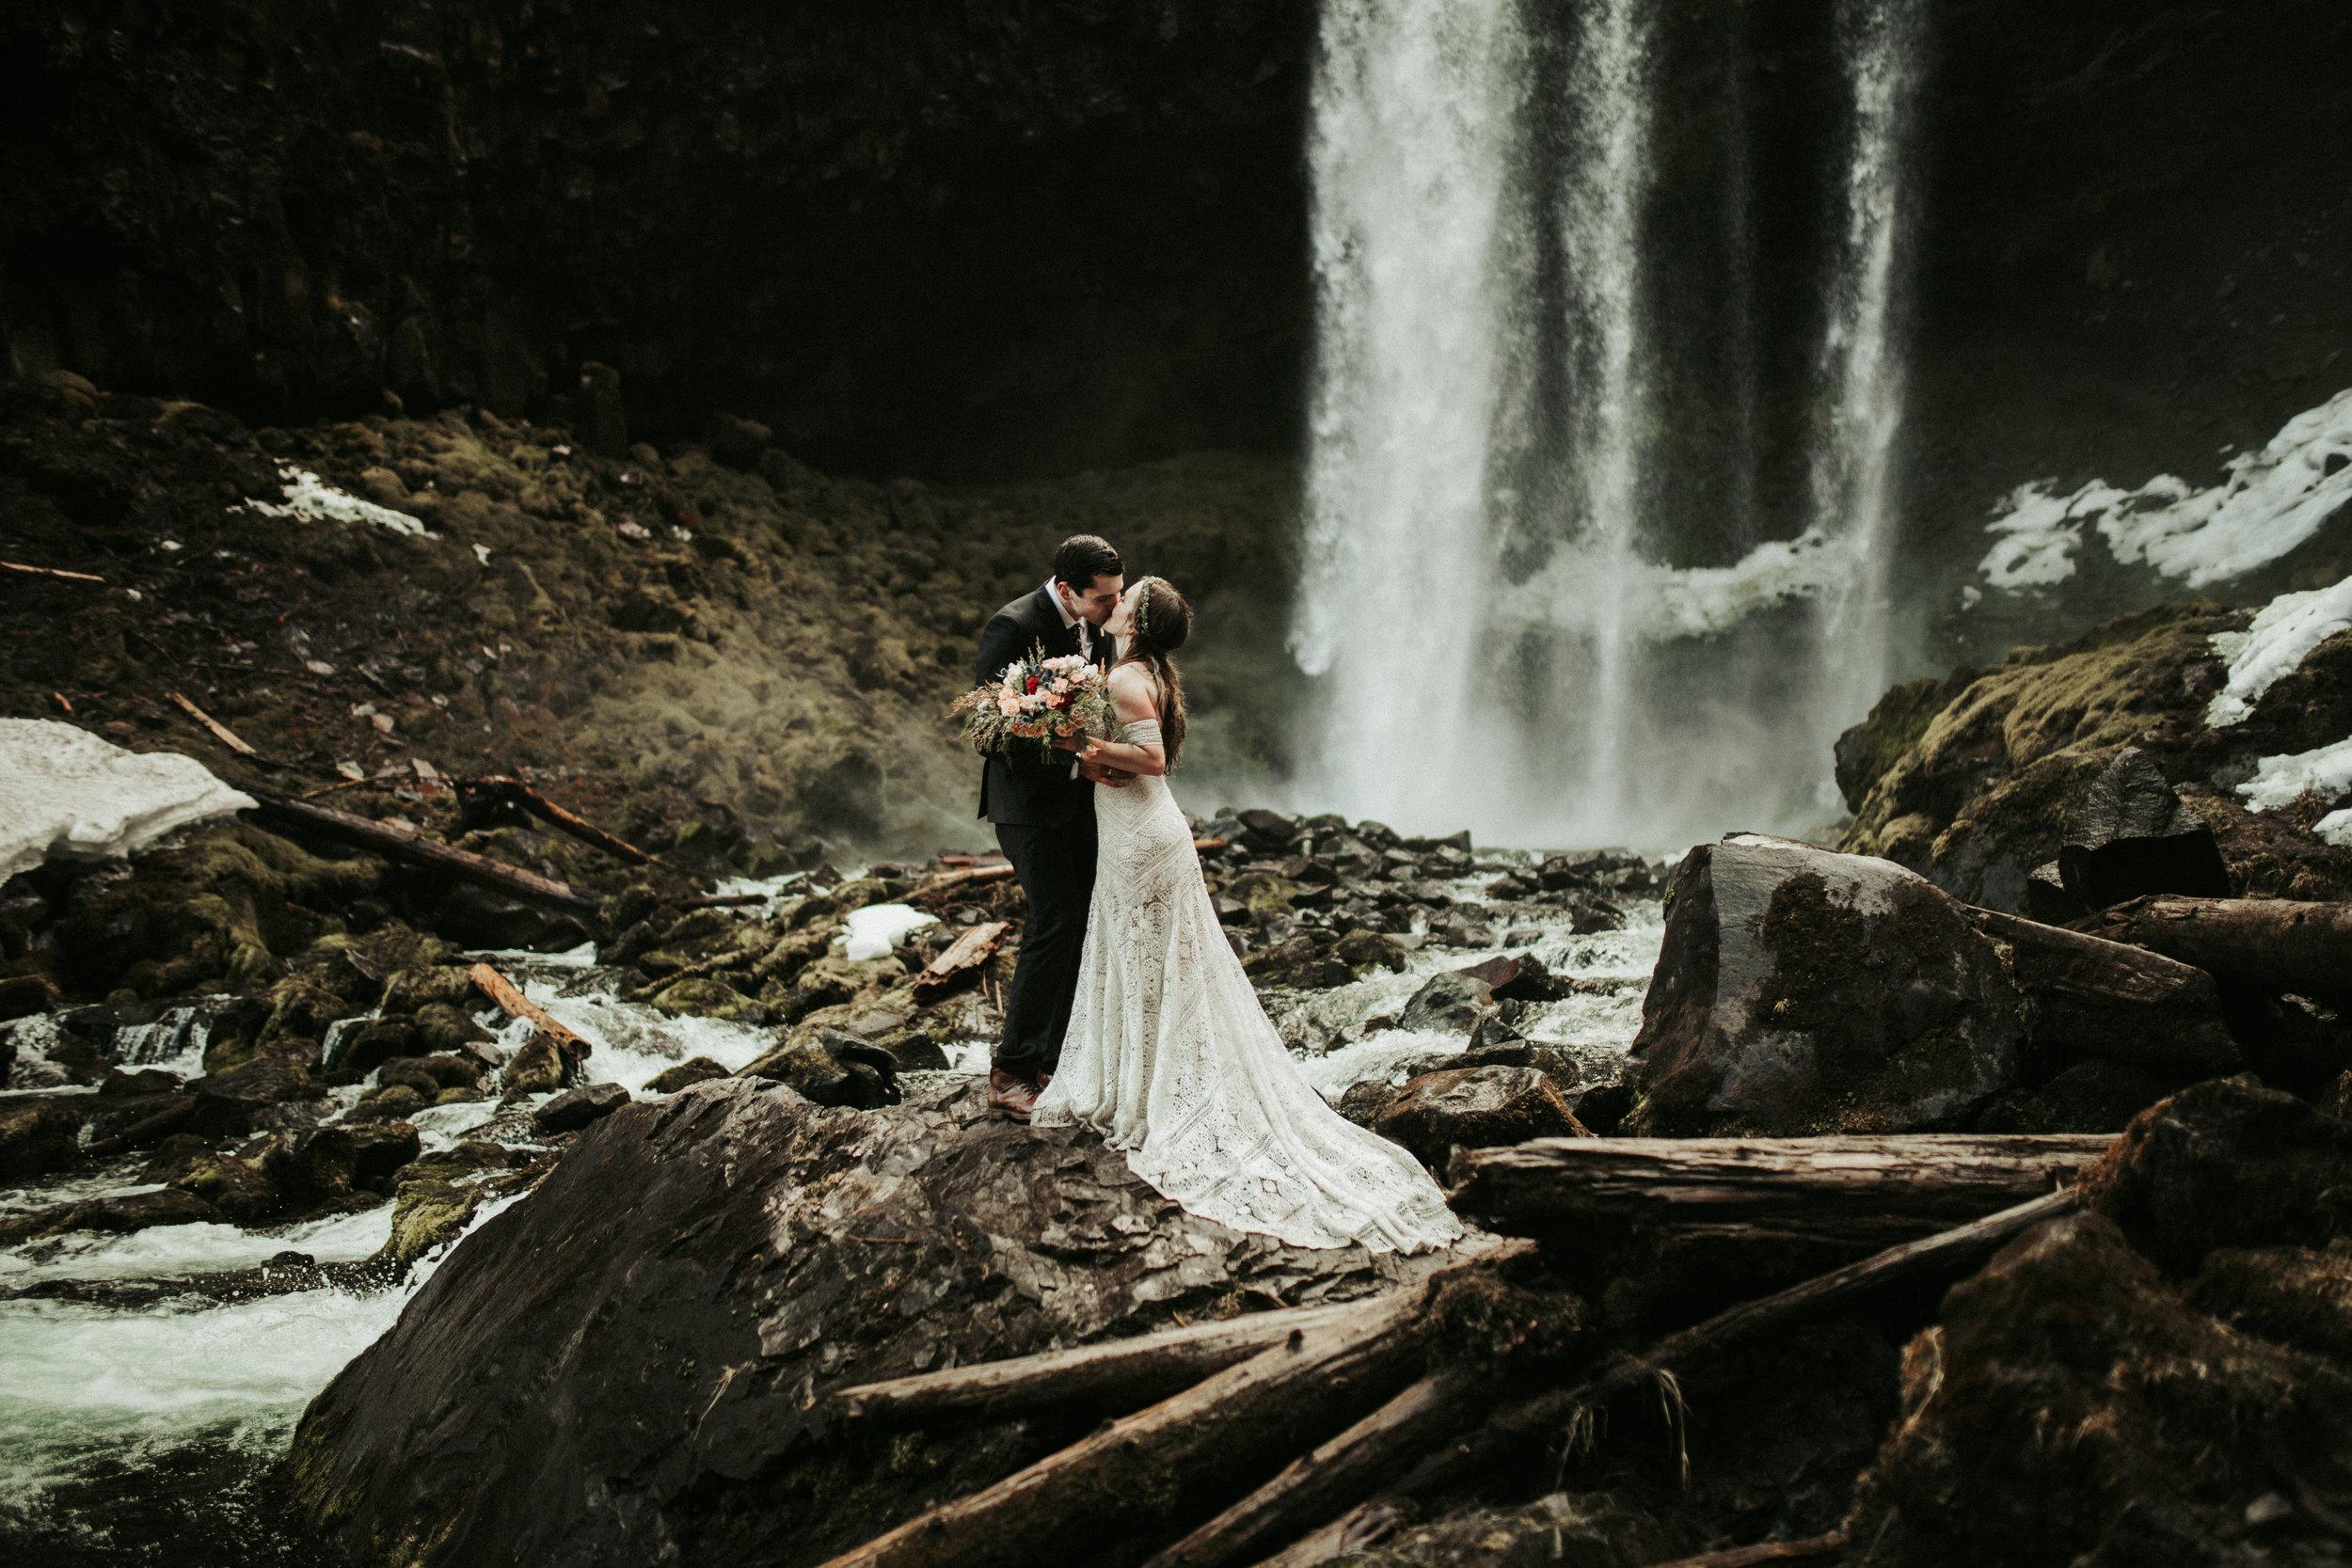 Oregon elopement - Tamanawas Falls trail